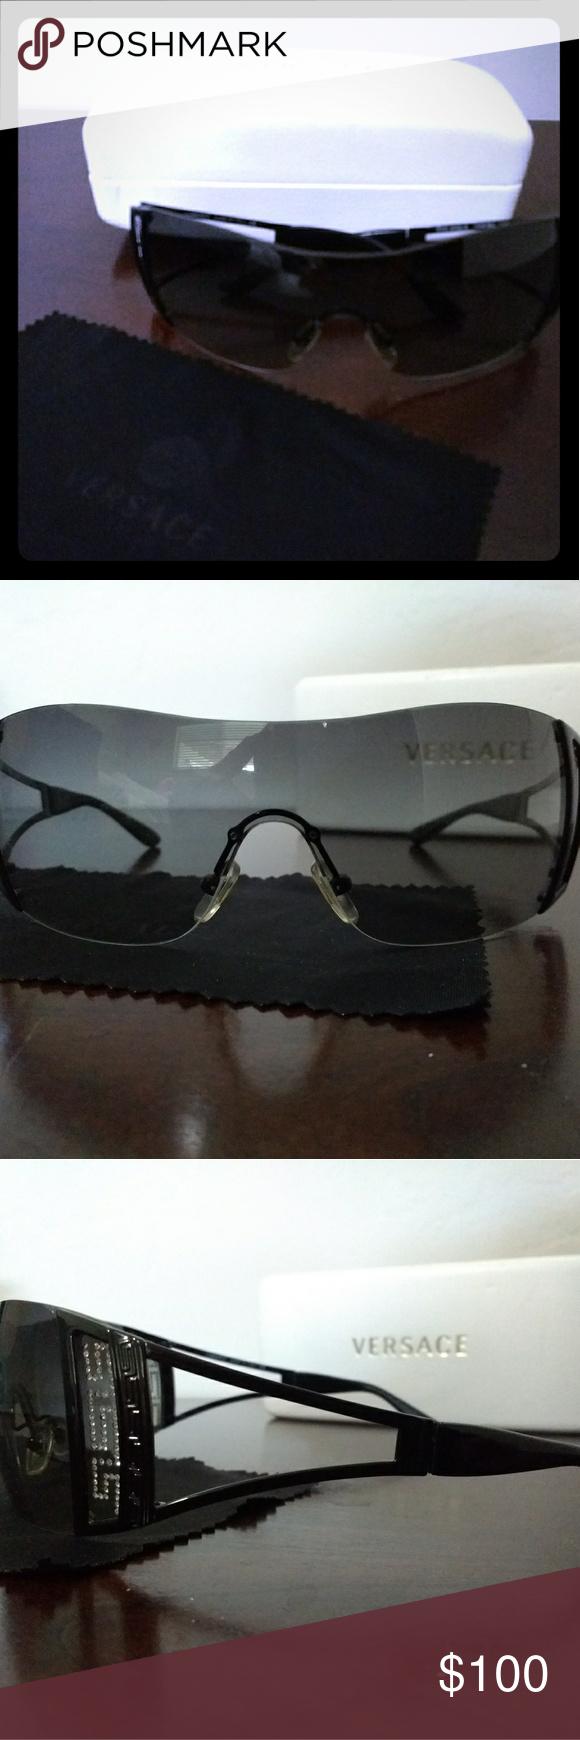 a6ce231c1cb9 Versace sunglasses Excellent condition. Versace sunglasses. Model 2058-B.  Comes with original